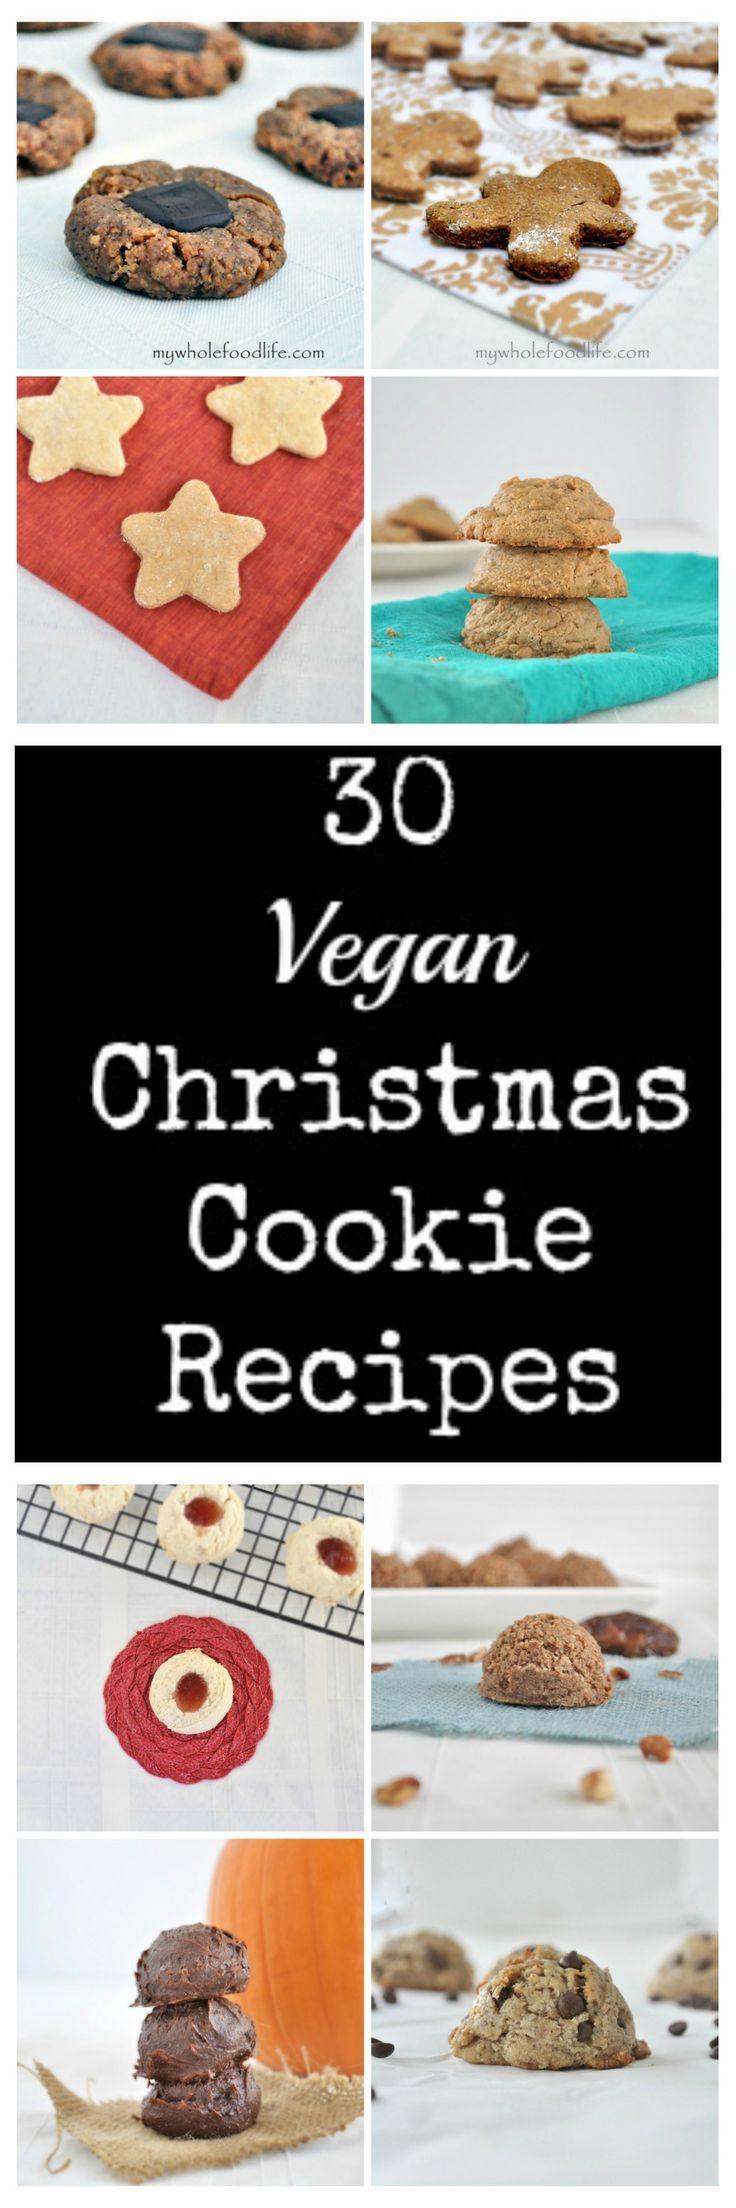 Vegan Christmas Cookies Recipe  17 Best ideas about Vegan Christmas Cookies on Pinterest